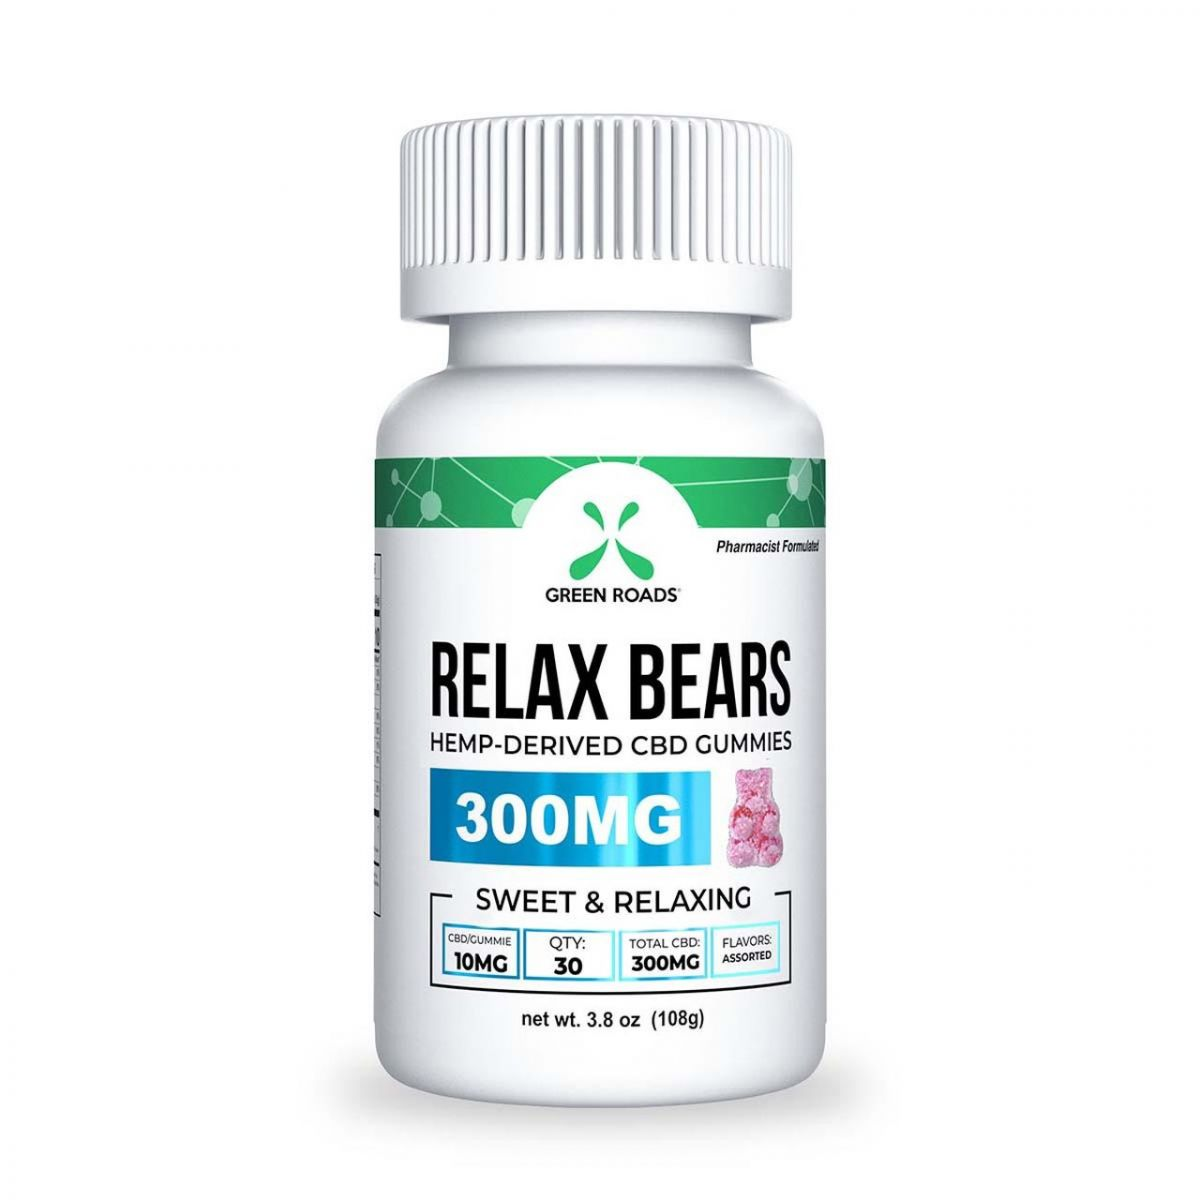 Green Roads 300mg Relax Bears CBD Gummies